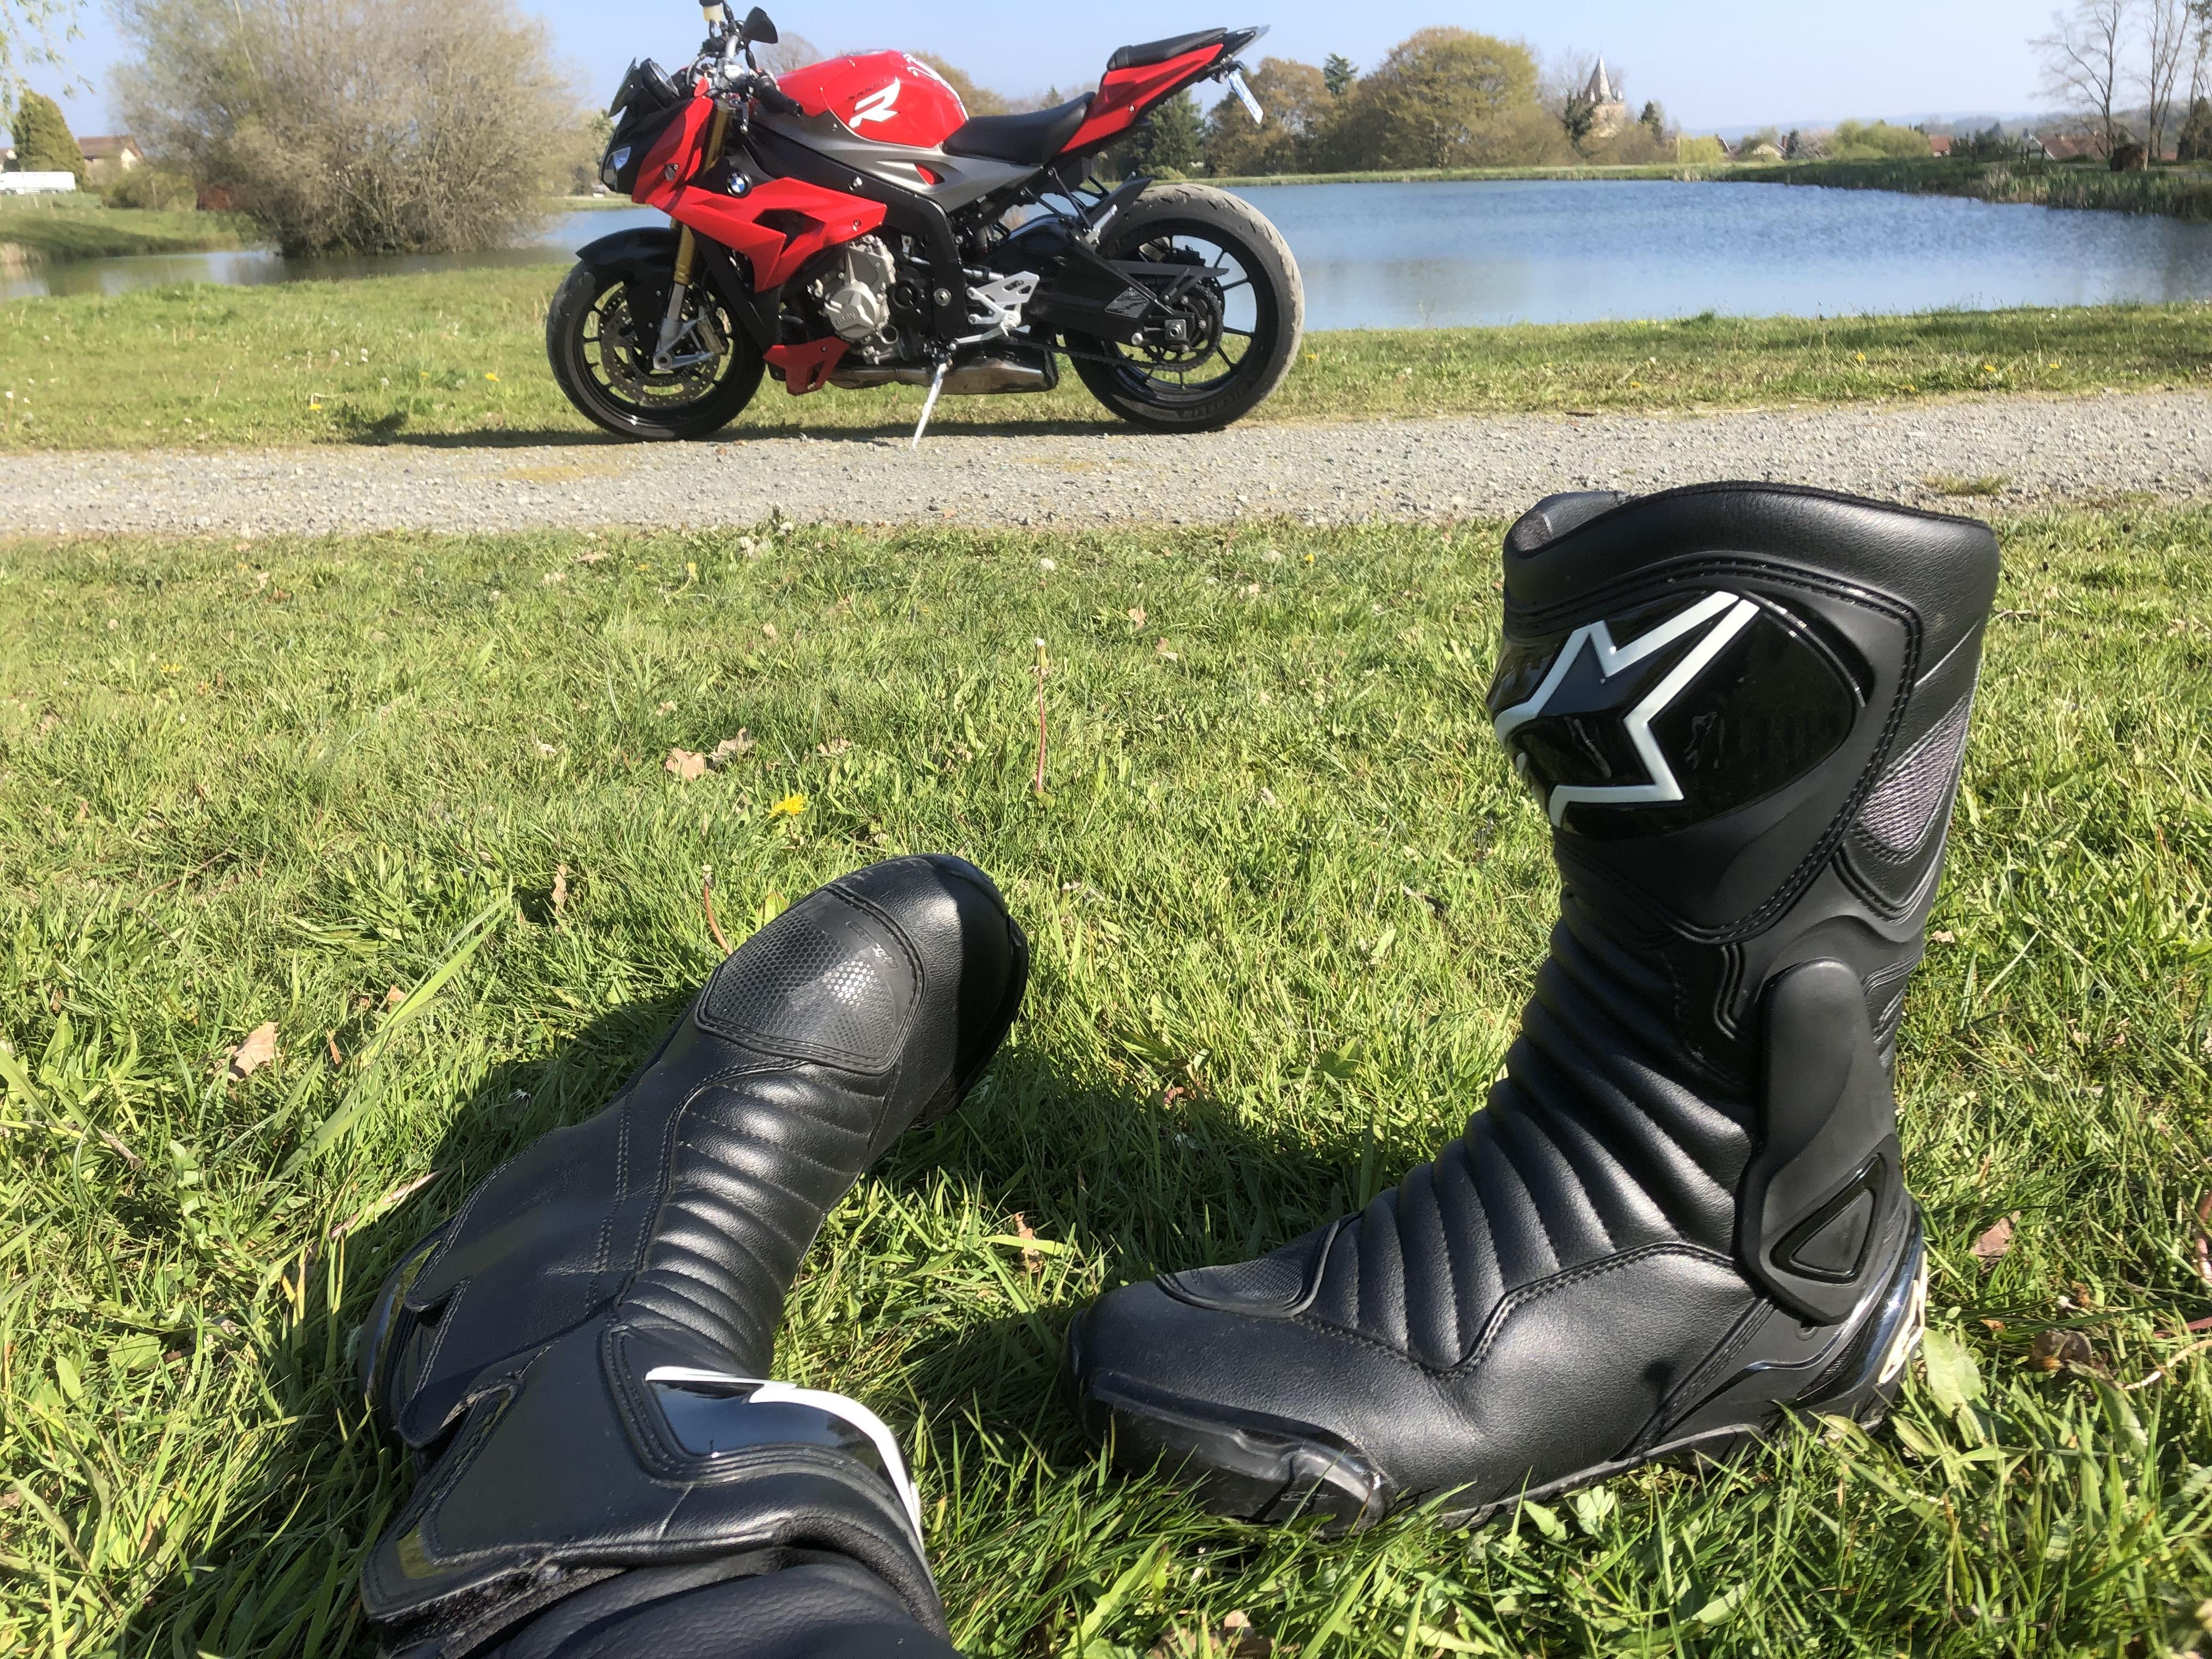 Focus sur les bottes Alpinestars SMX 6 V2